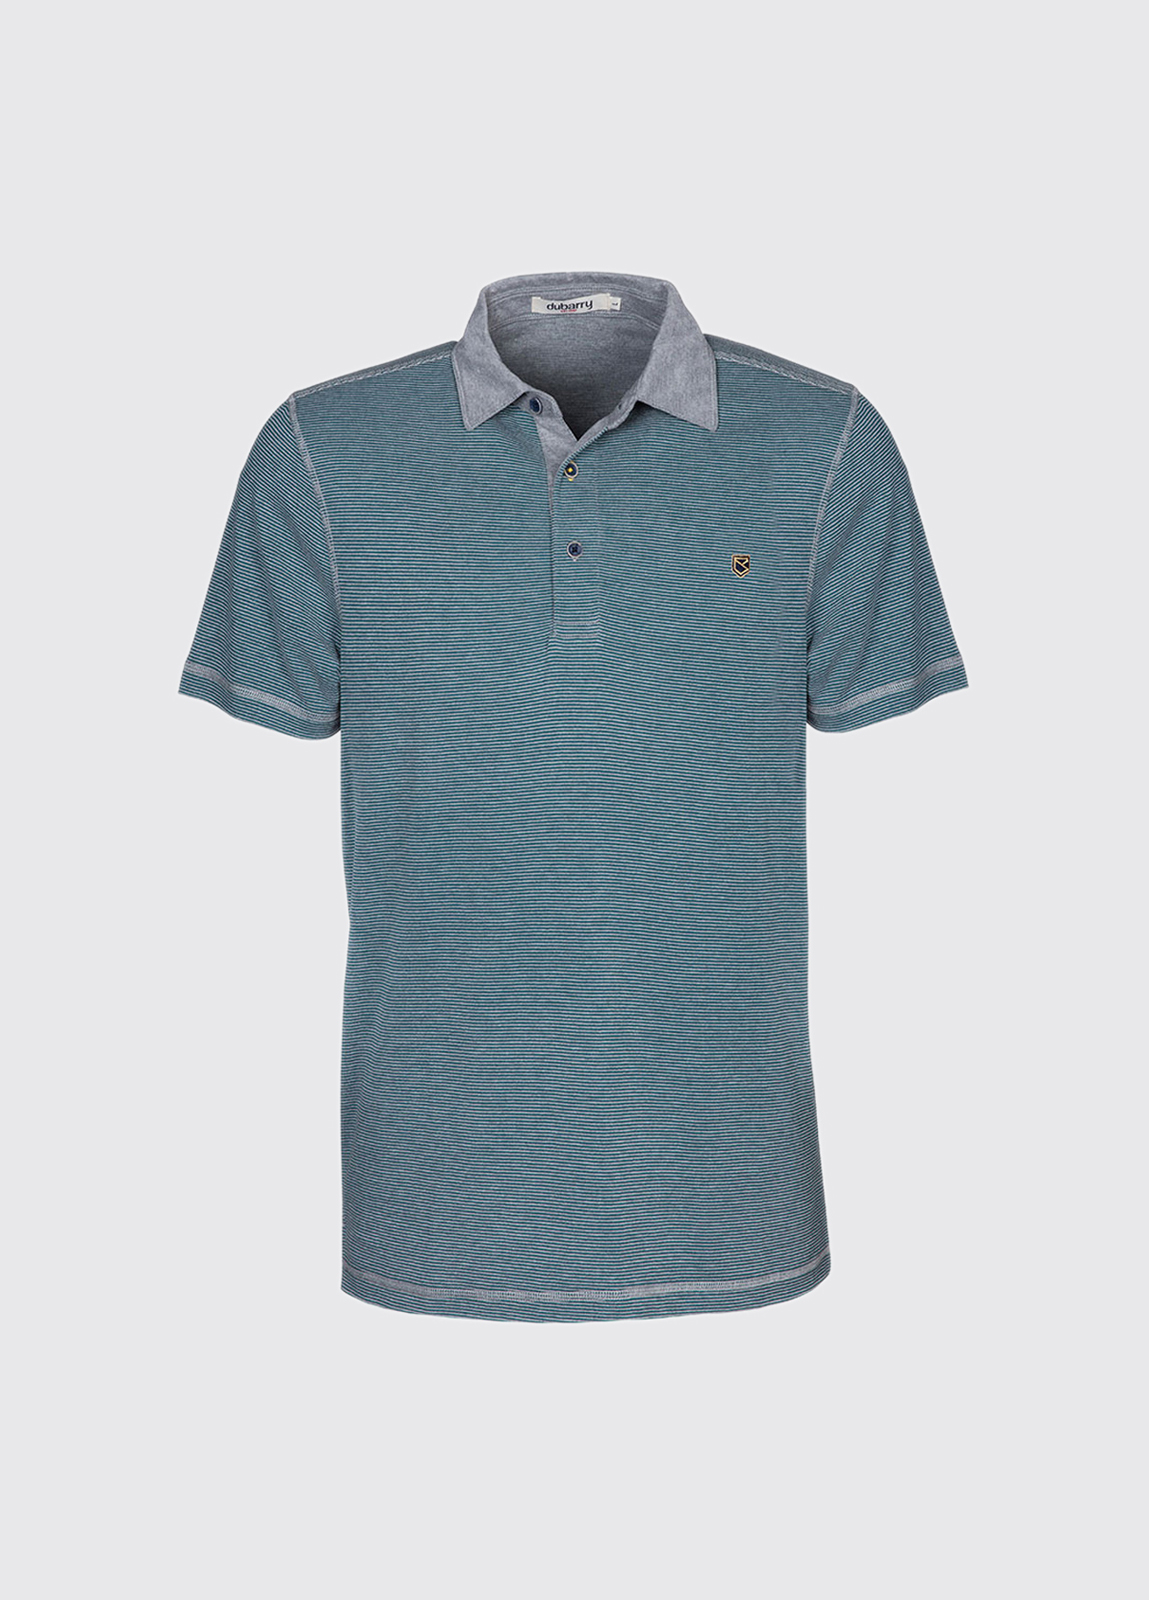 Drumcliff Polo Shirt - Teal